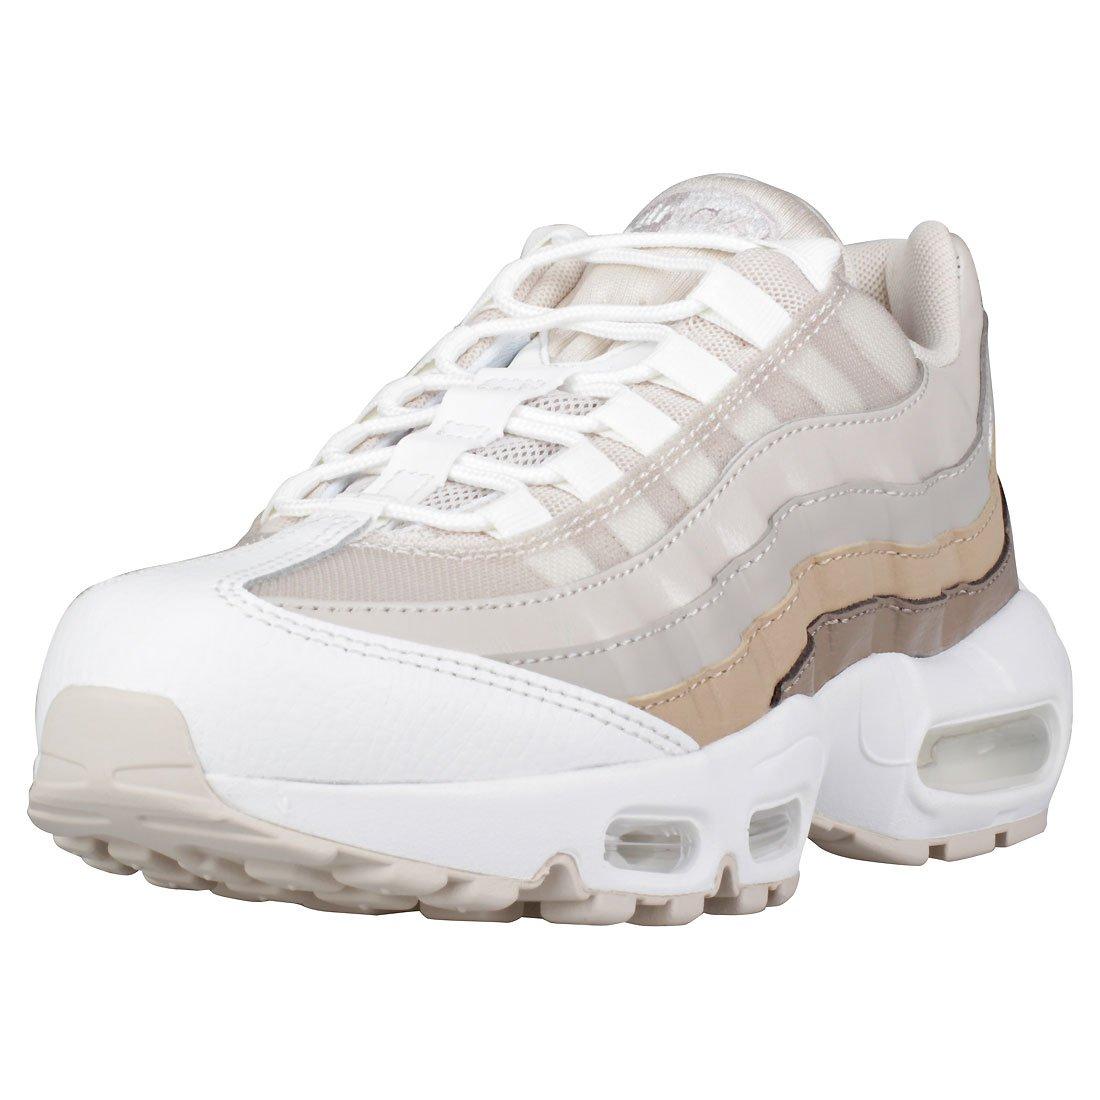 Nike Calzado Deportivo Para Mujer, Color Hueso, Marca, Modelo Calzado Deportivo Para Mujer Air Max 95 Hueso 41 EU|Hueso